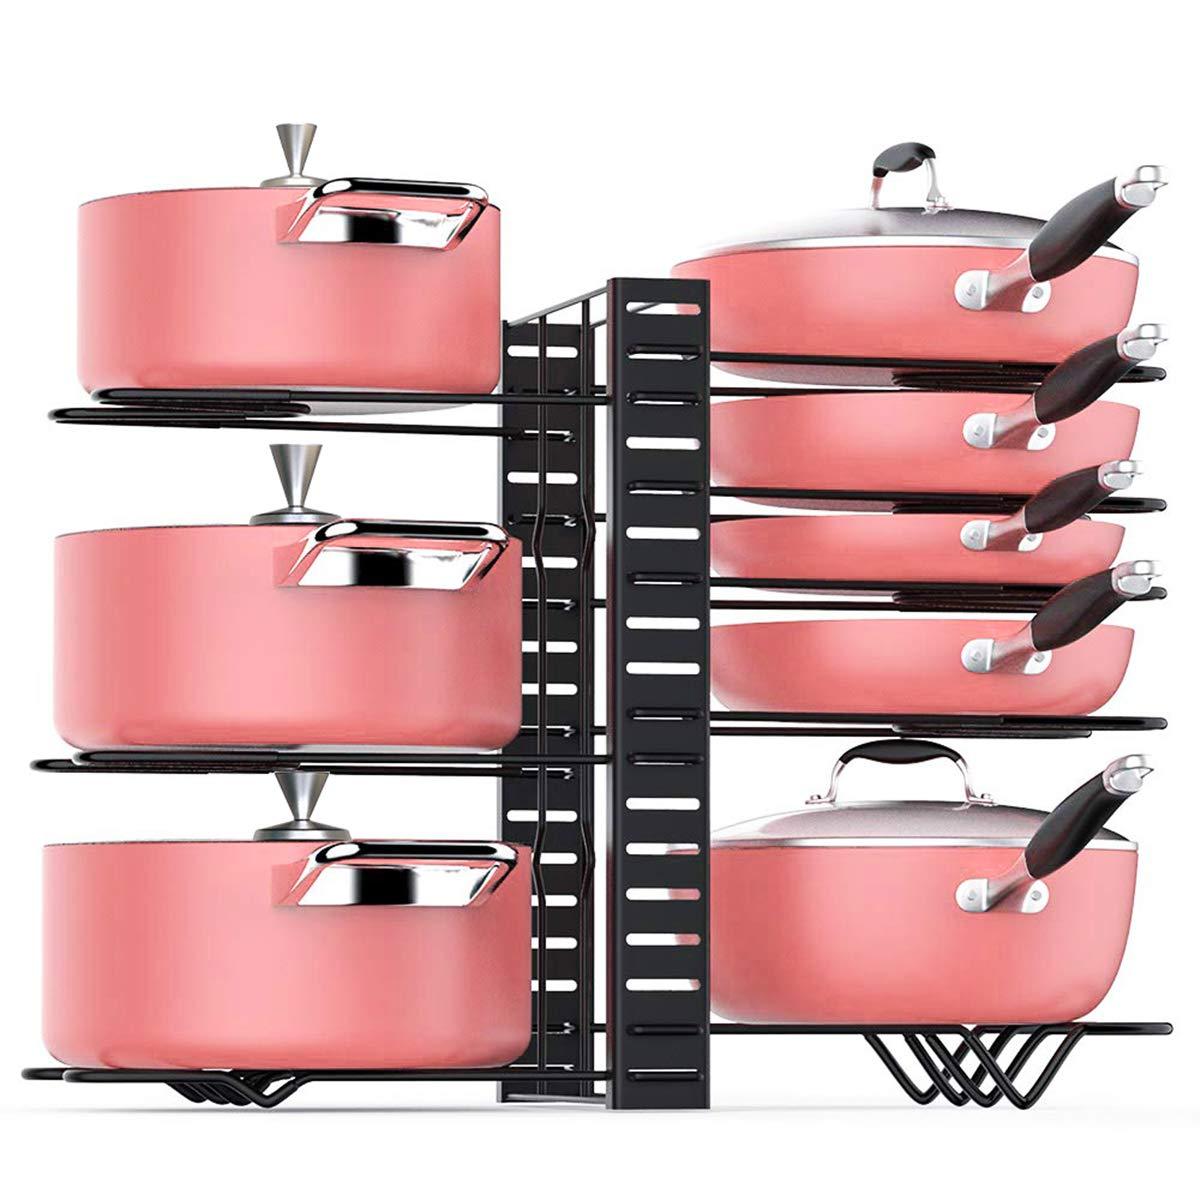 TOPNEW Pot Rack Organizer 3 DIY Methods Height Adjustable Cookware Organizer Kitchen Pan and Pot Lid Holder (Black)